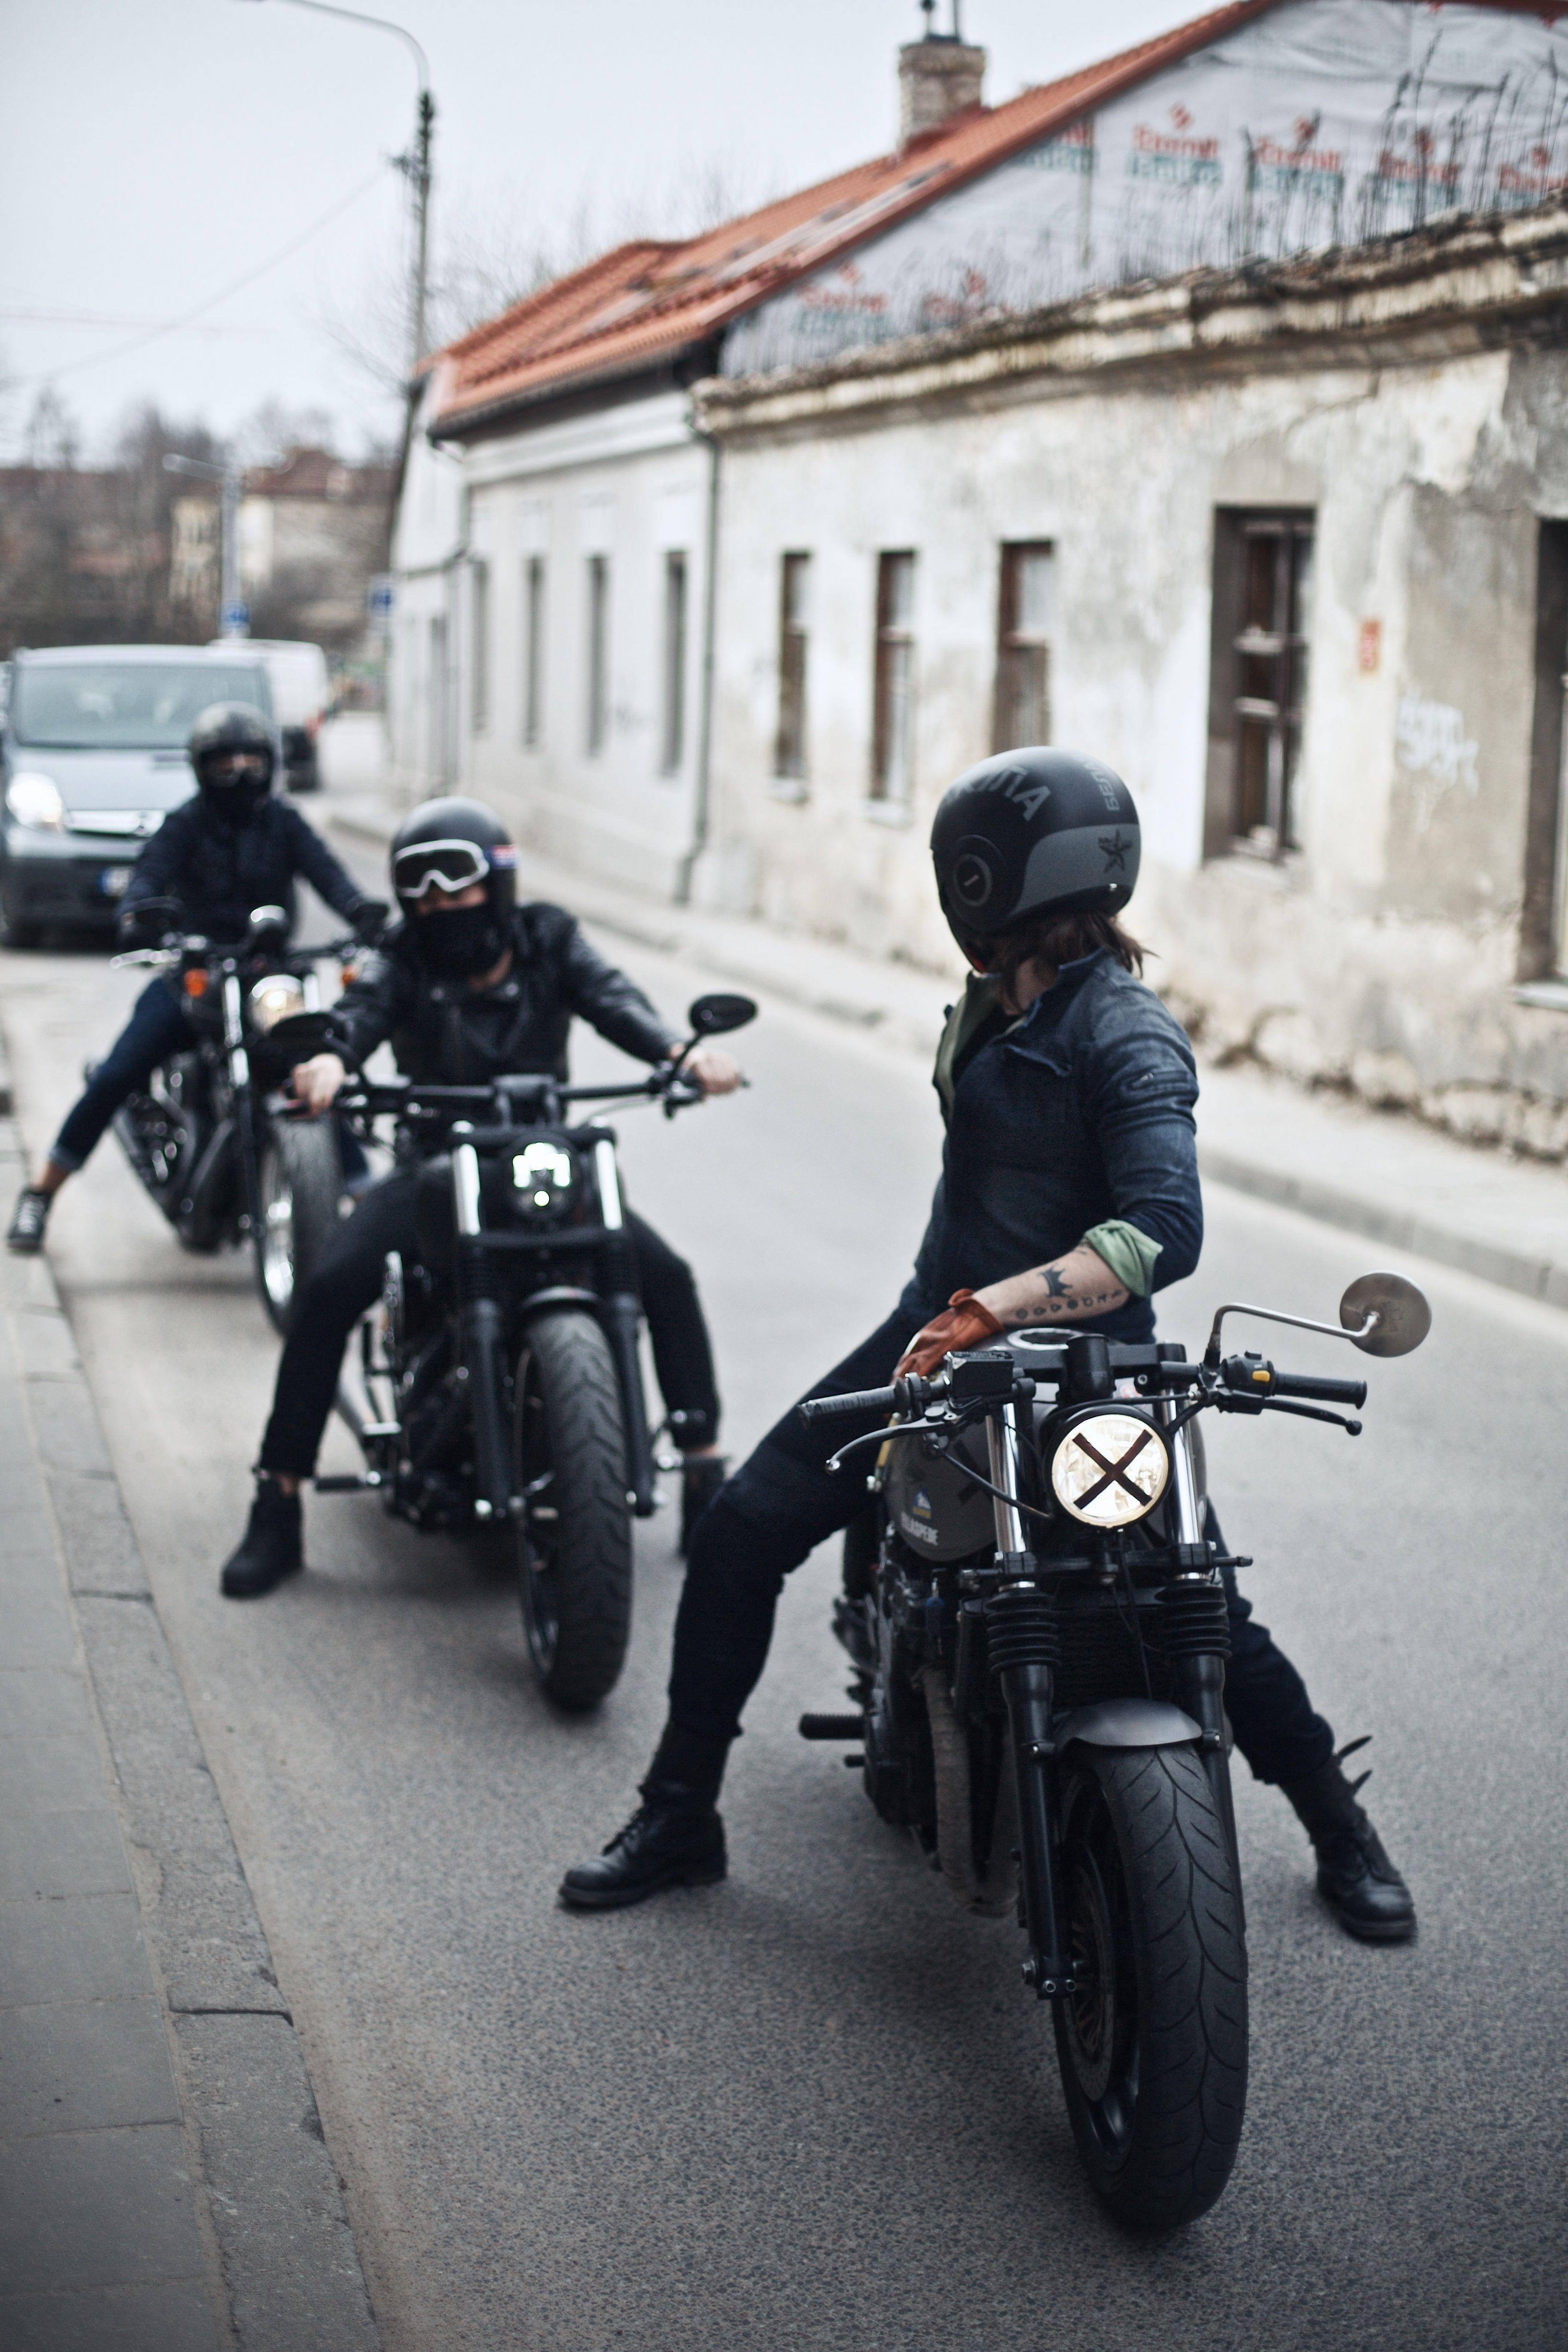 Harley Davidson Yamaha And Victory Motorcycles With Pando Ace Riders Motorcycles Riders Harleydavid Motorcycle Wear Victory Motorcycles Motorcycle Outfit